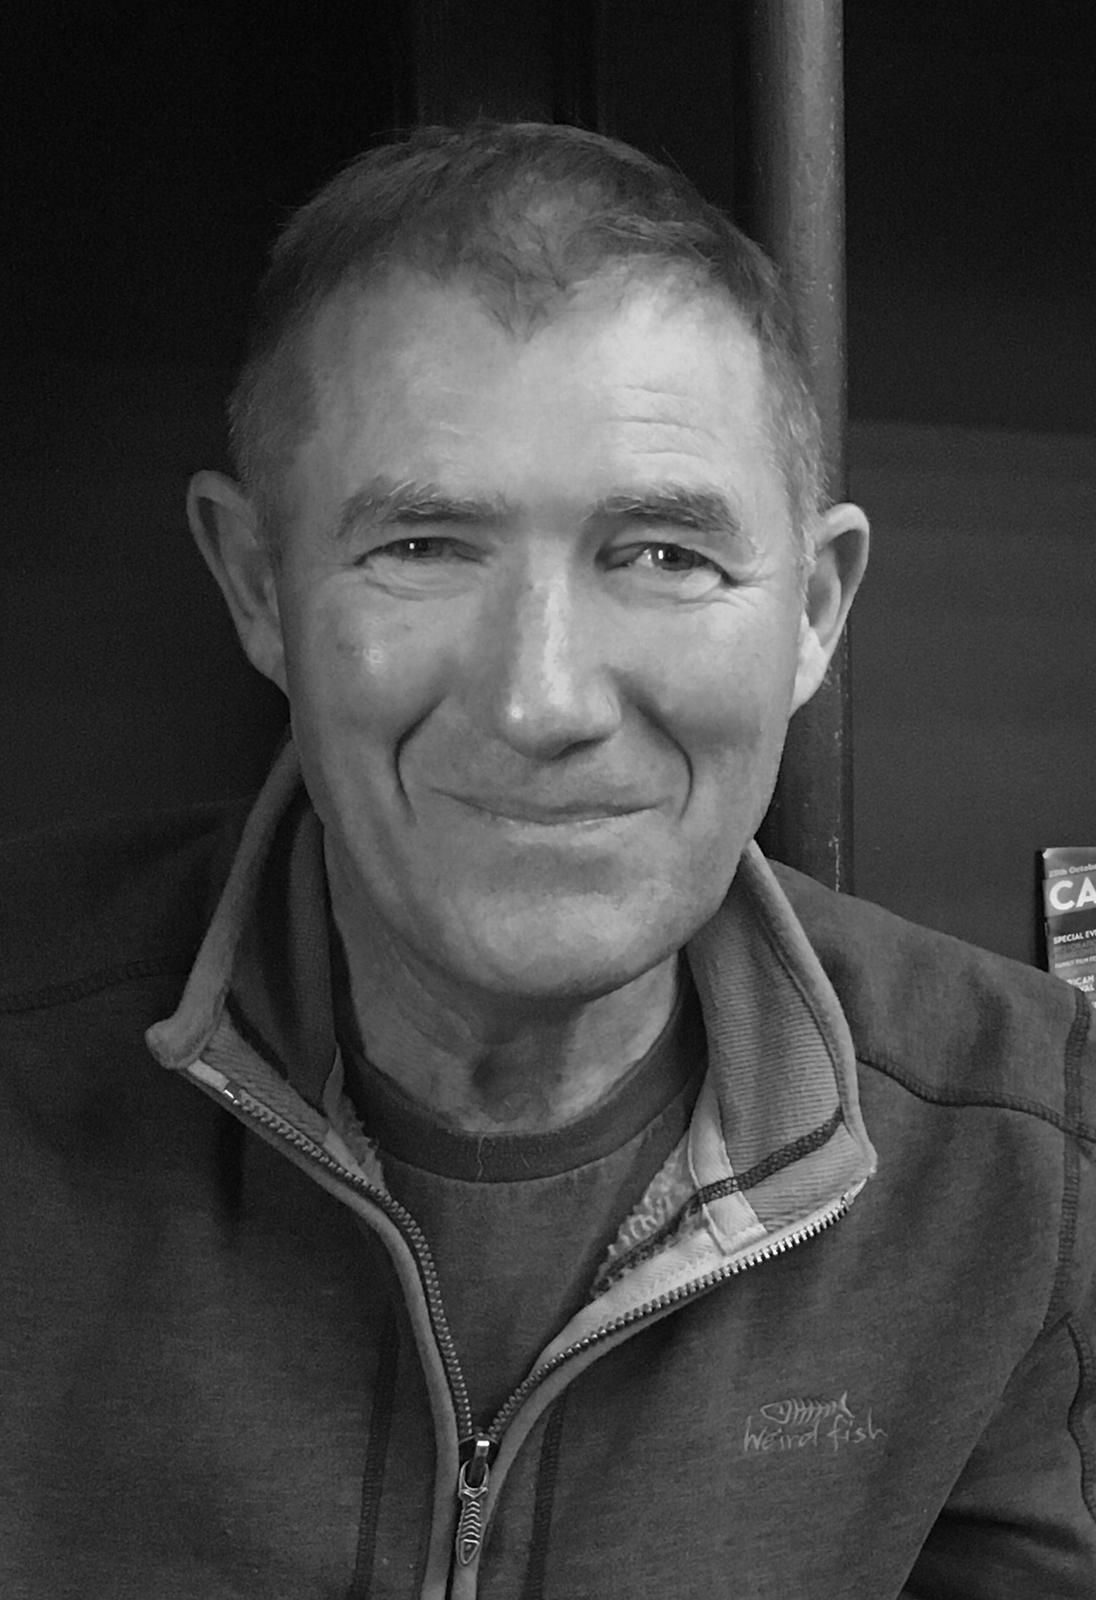 Dr Richard O'Sullivan